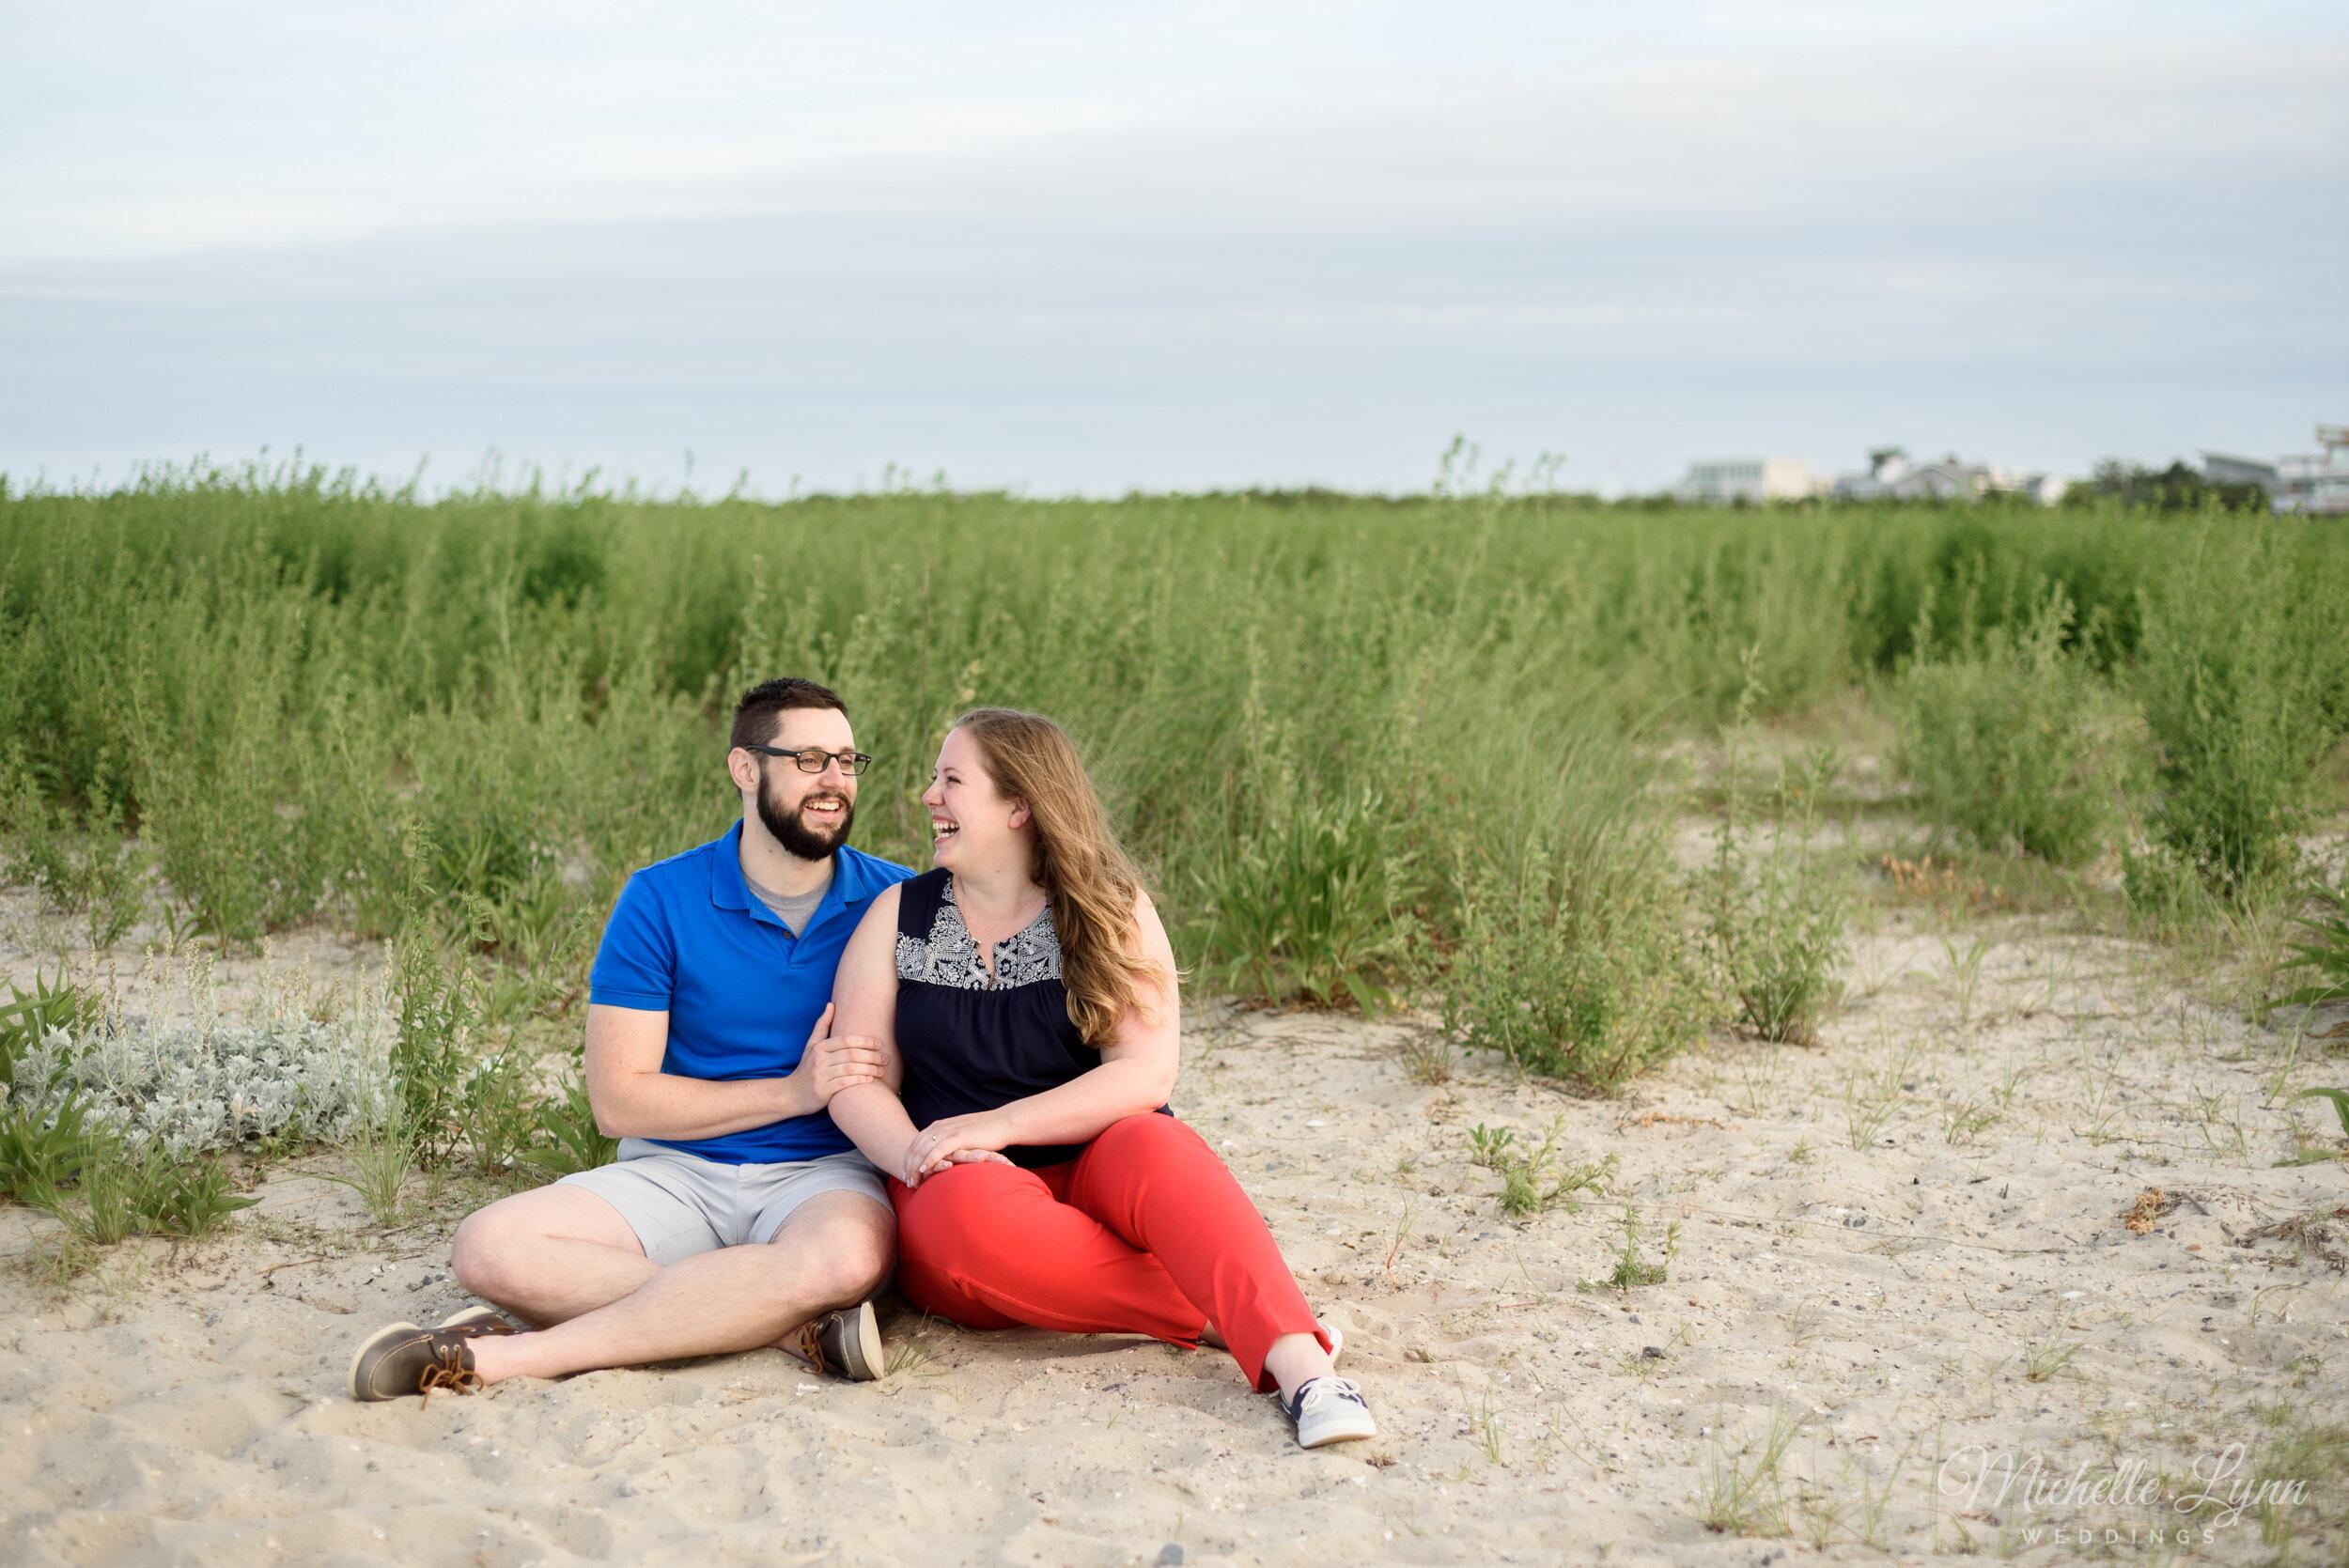 barnegat-lighthouse-engagement-photos-michelle-lynn-weddings-7.jpg